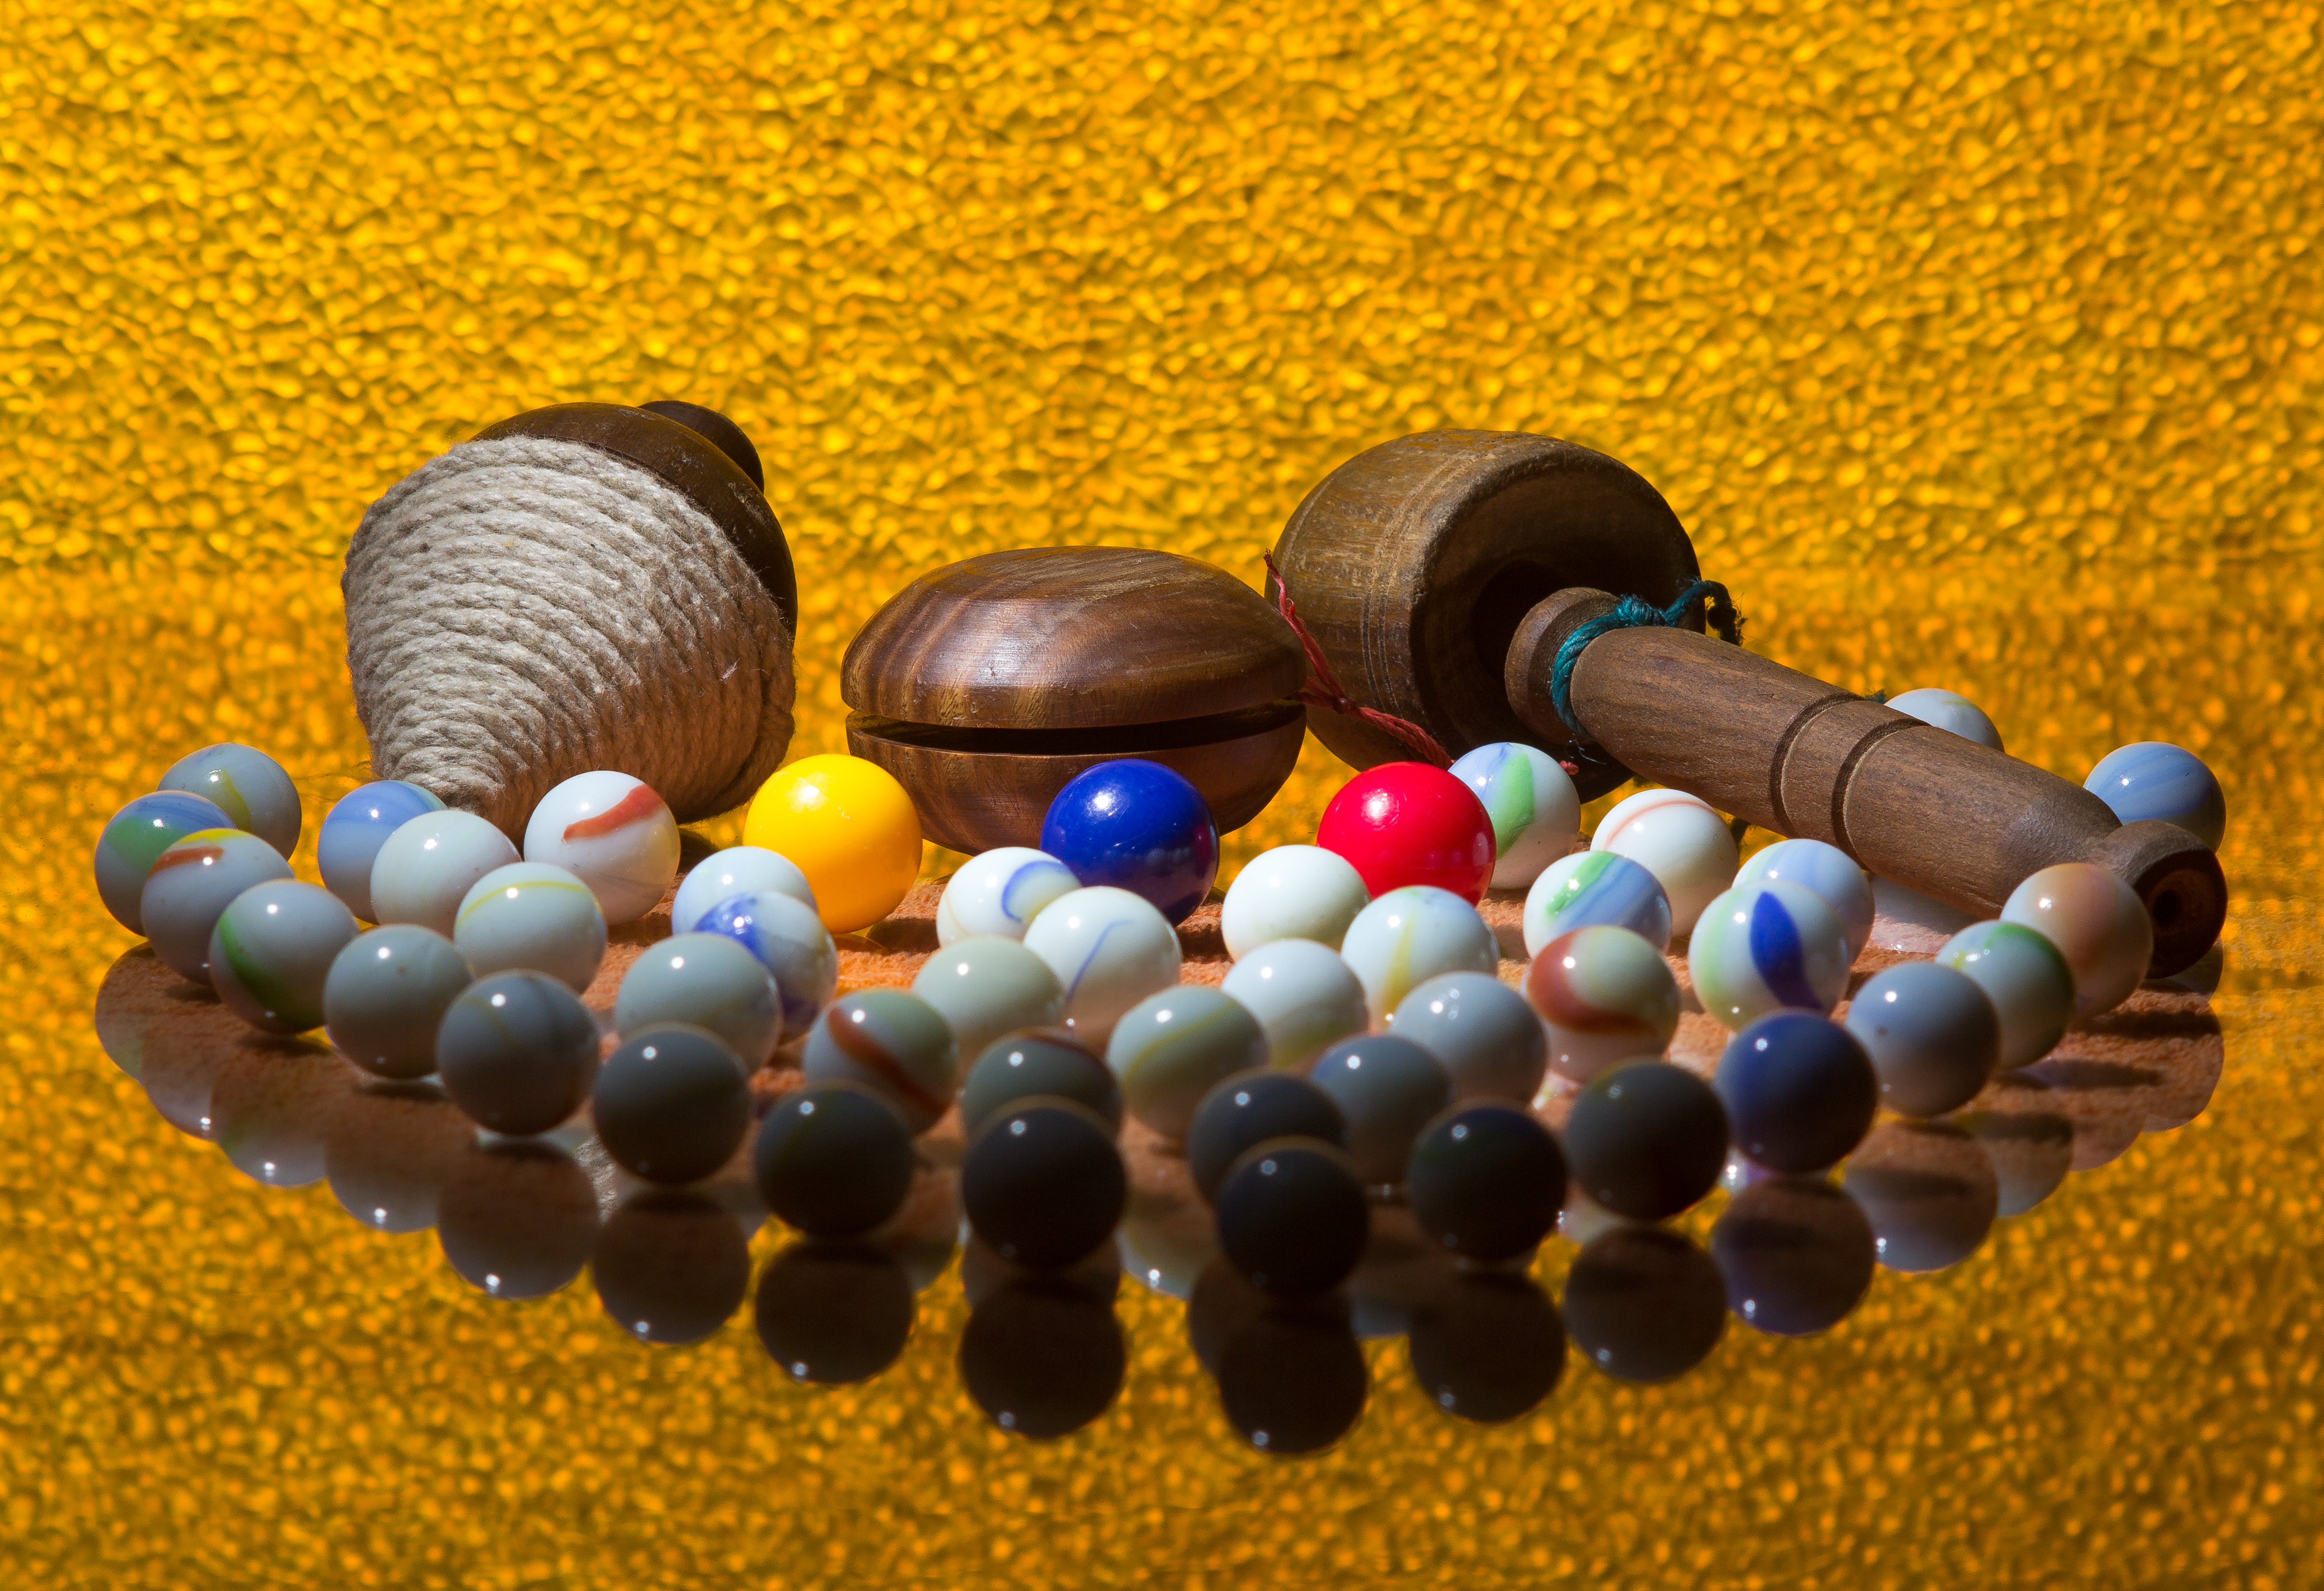 26 Peluches Dragons also Doll Rag furthermore 4 further Watch besides Munecas De Trapo La Nina Muneca Cristina Vestido Cuadro Azul 35 Cm. on munecas de trapo